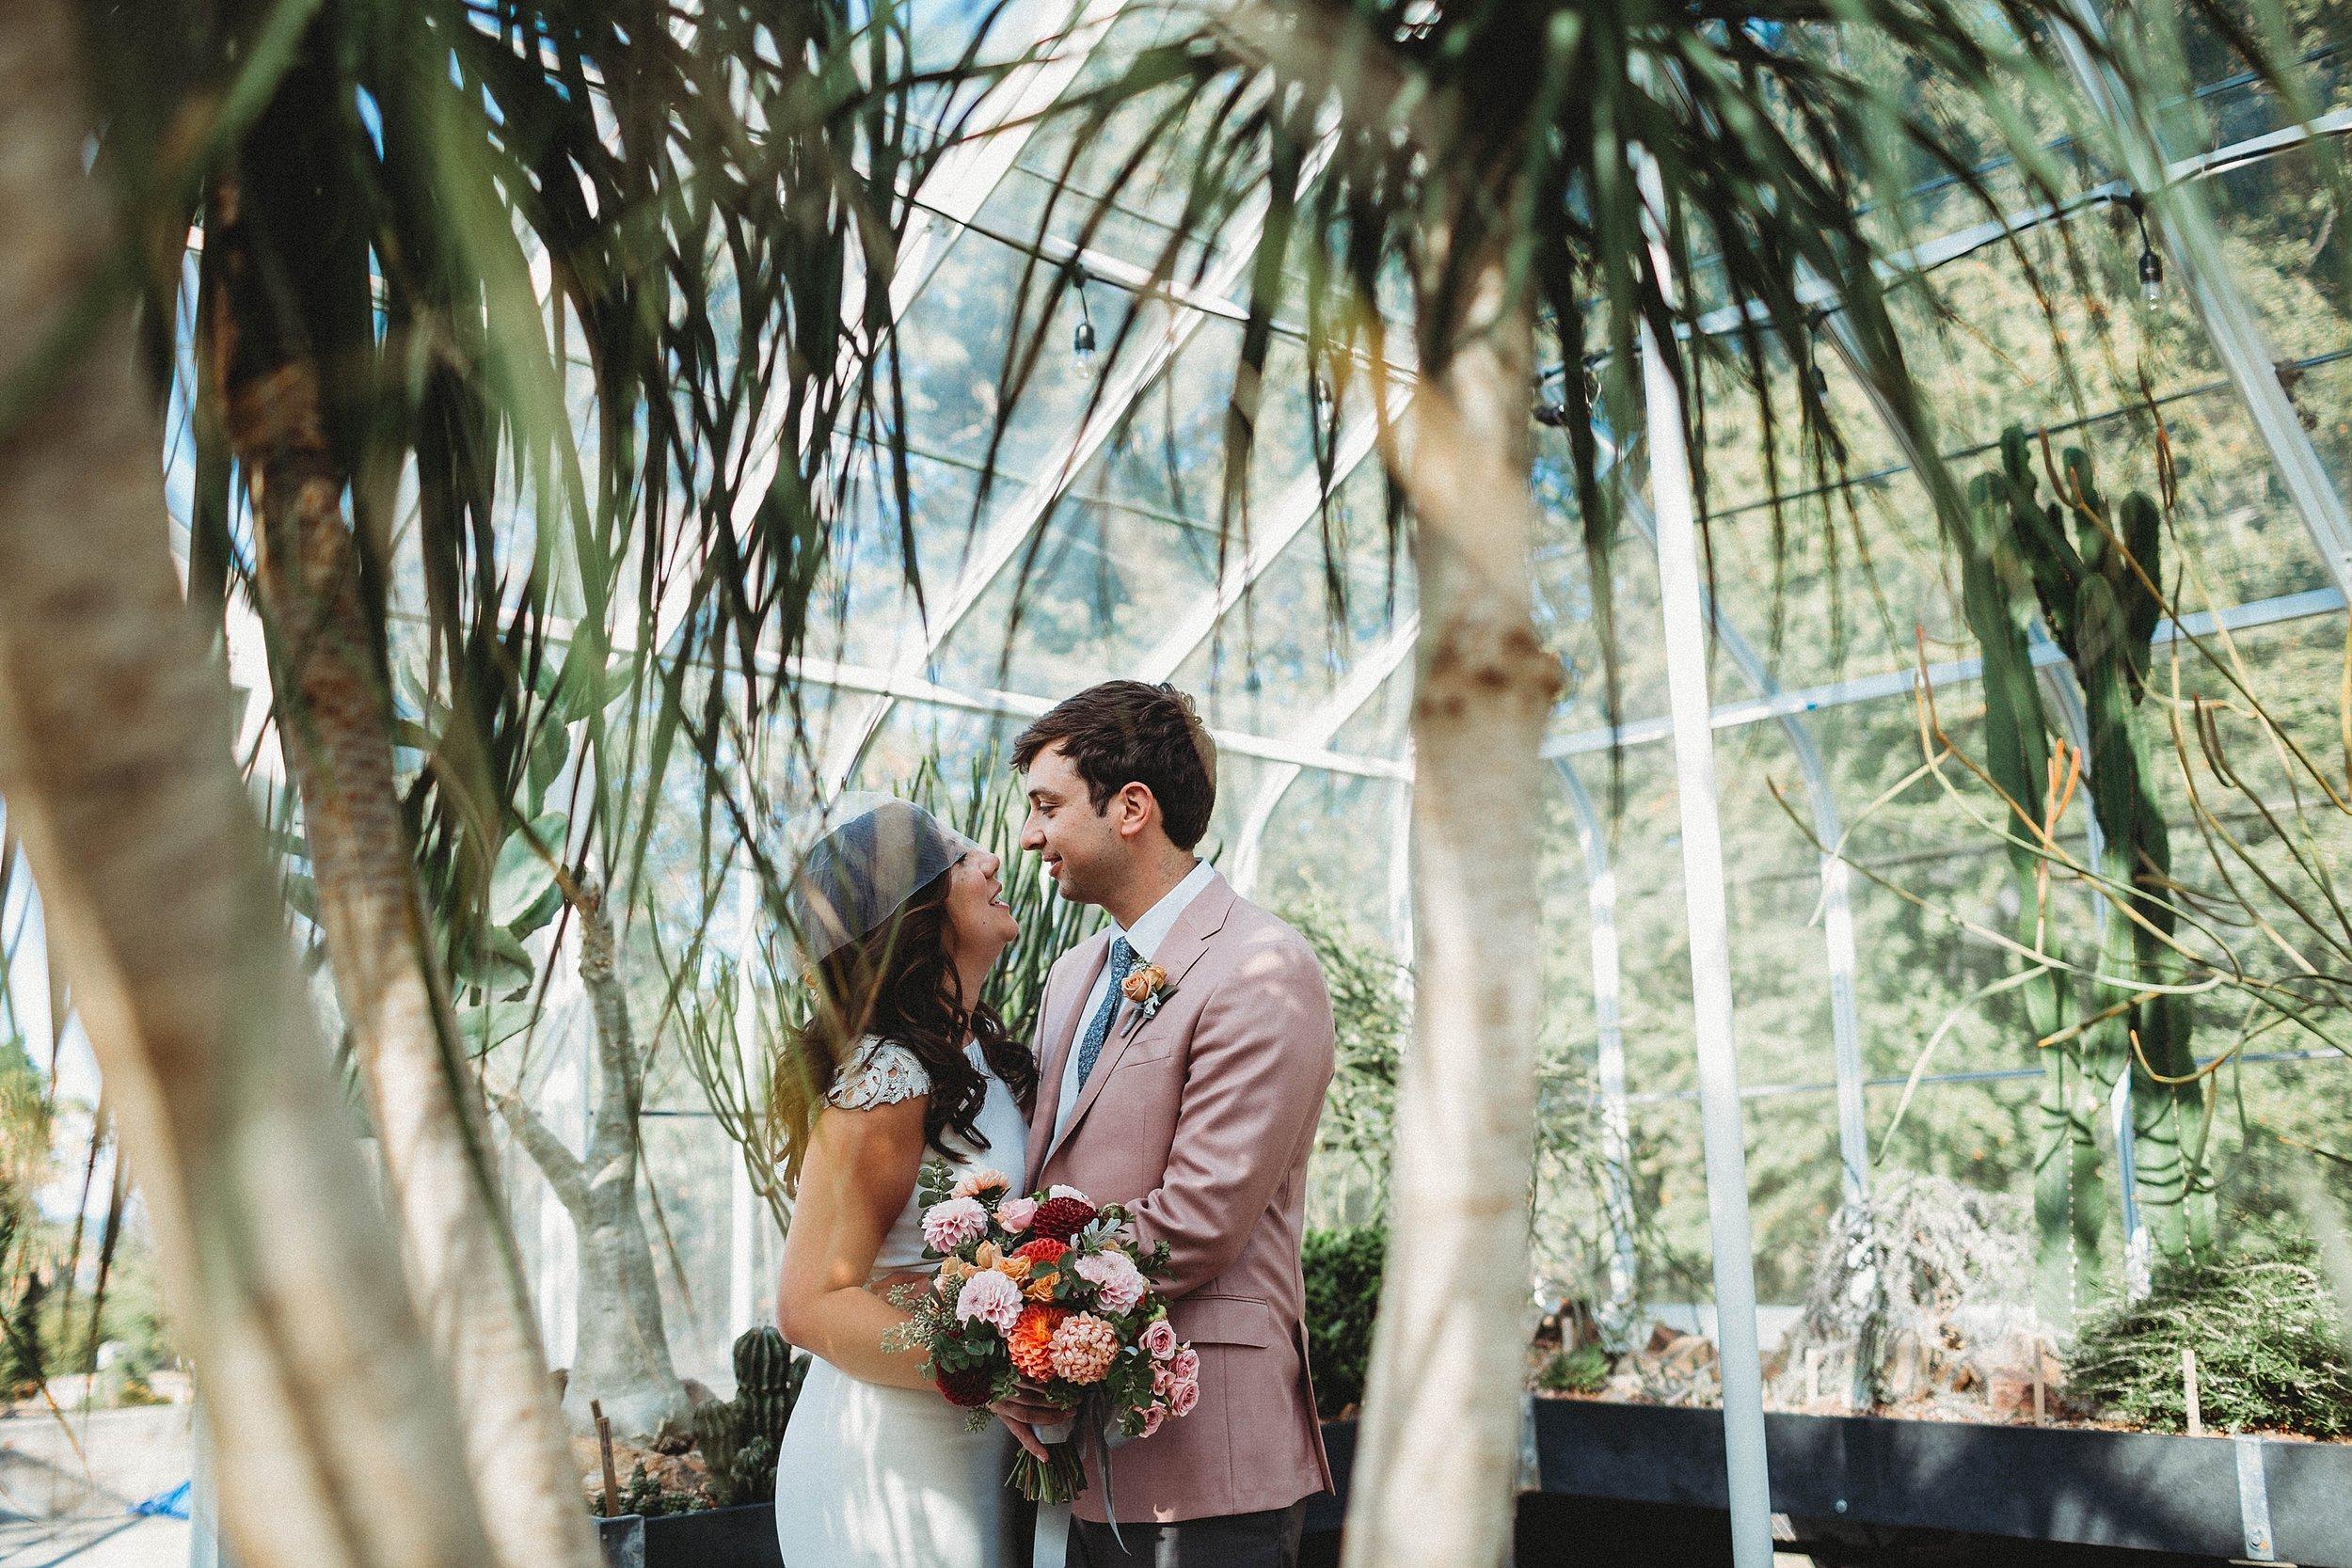 yinshi david - seattle wedding photographer - SAM wedding volunteer park reception -29.jpg